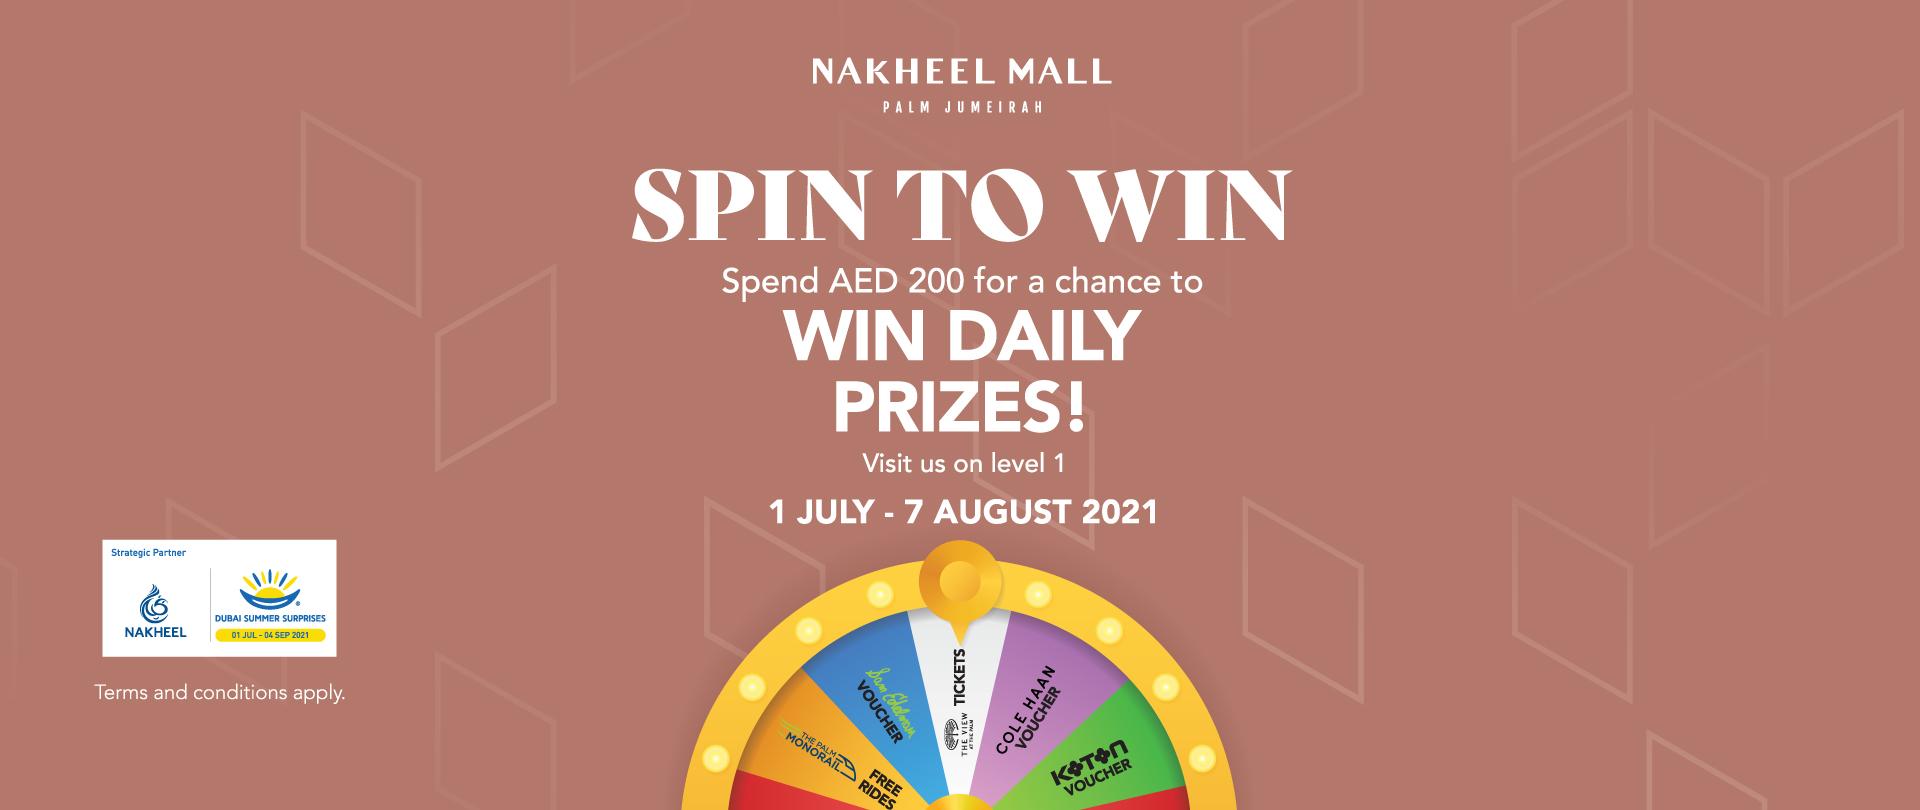 Spin to Win with Nakheel Mall Dubai Summer Surprises